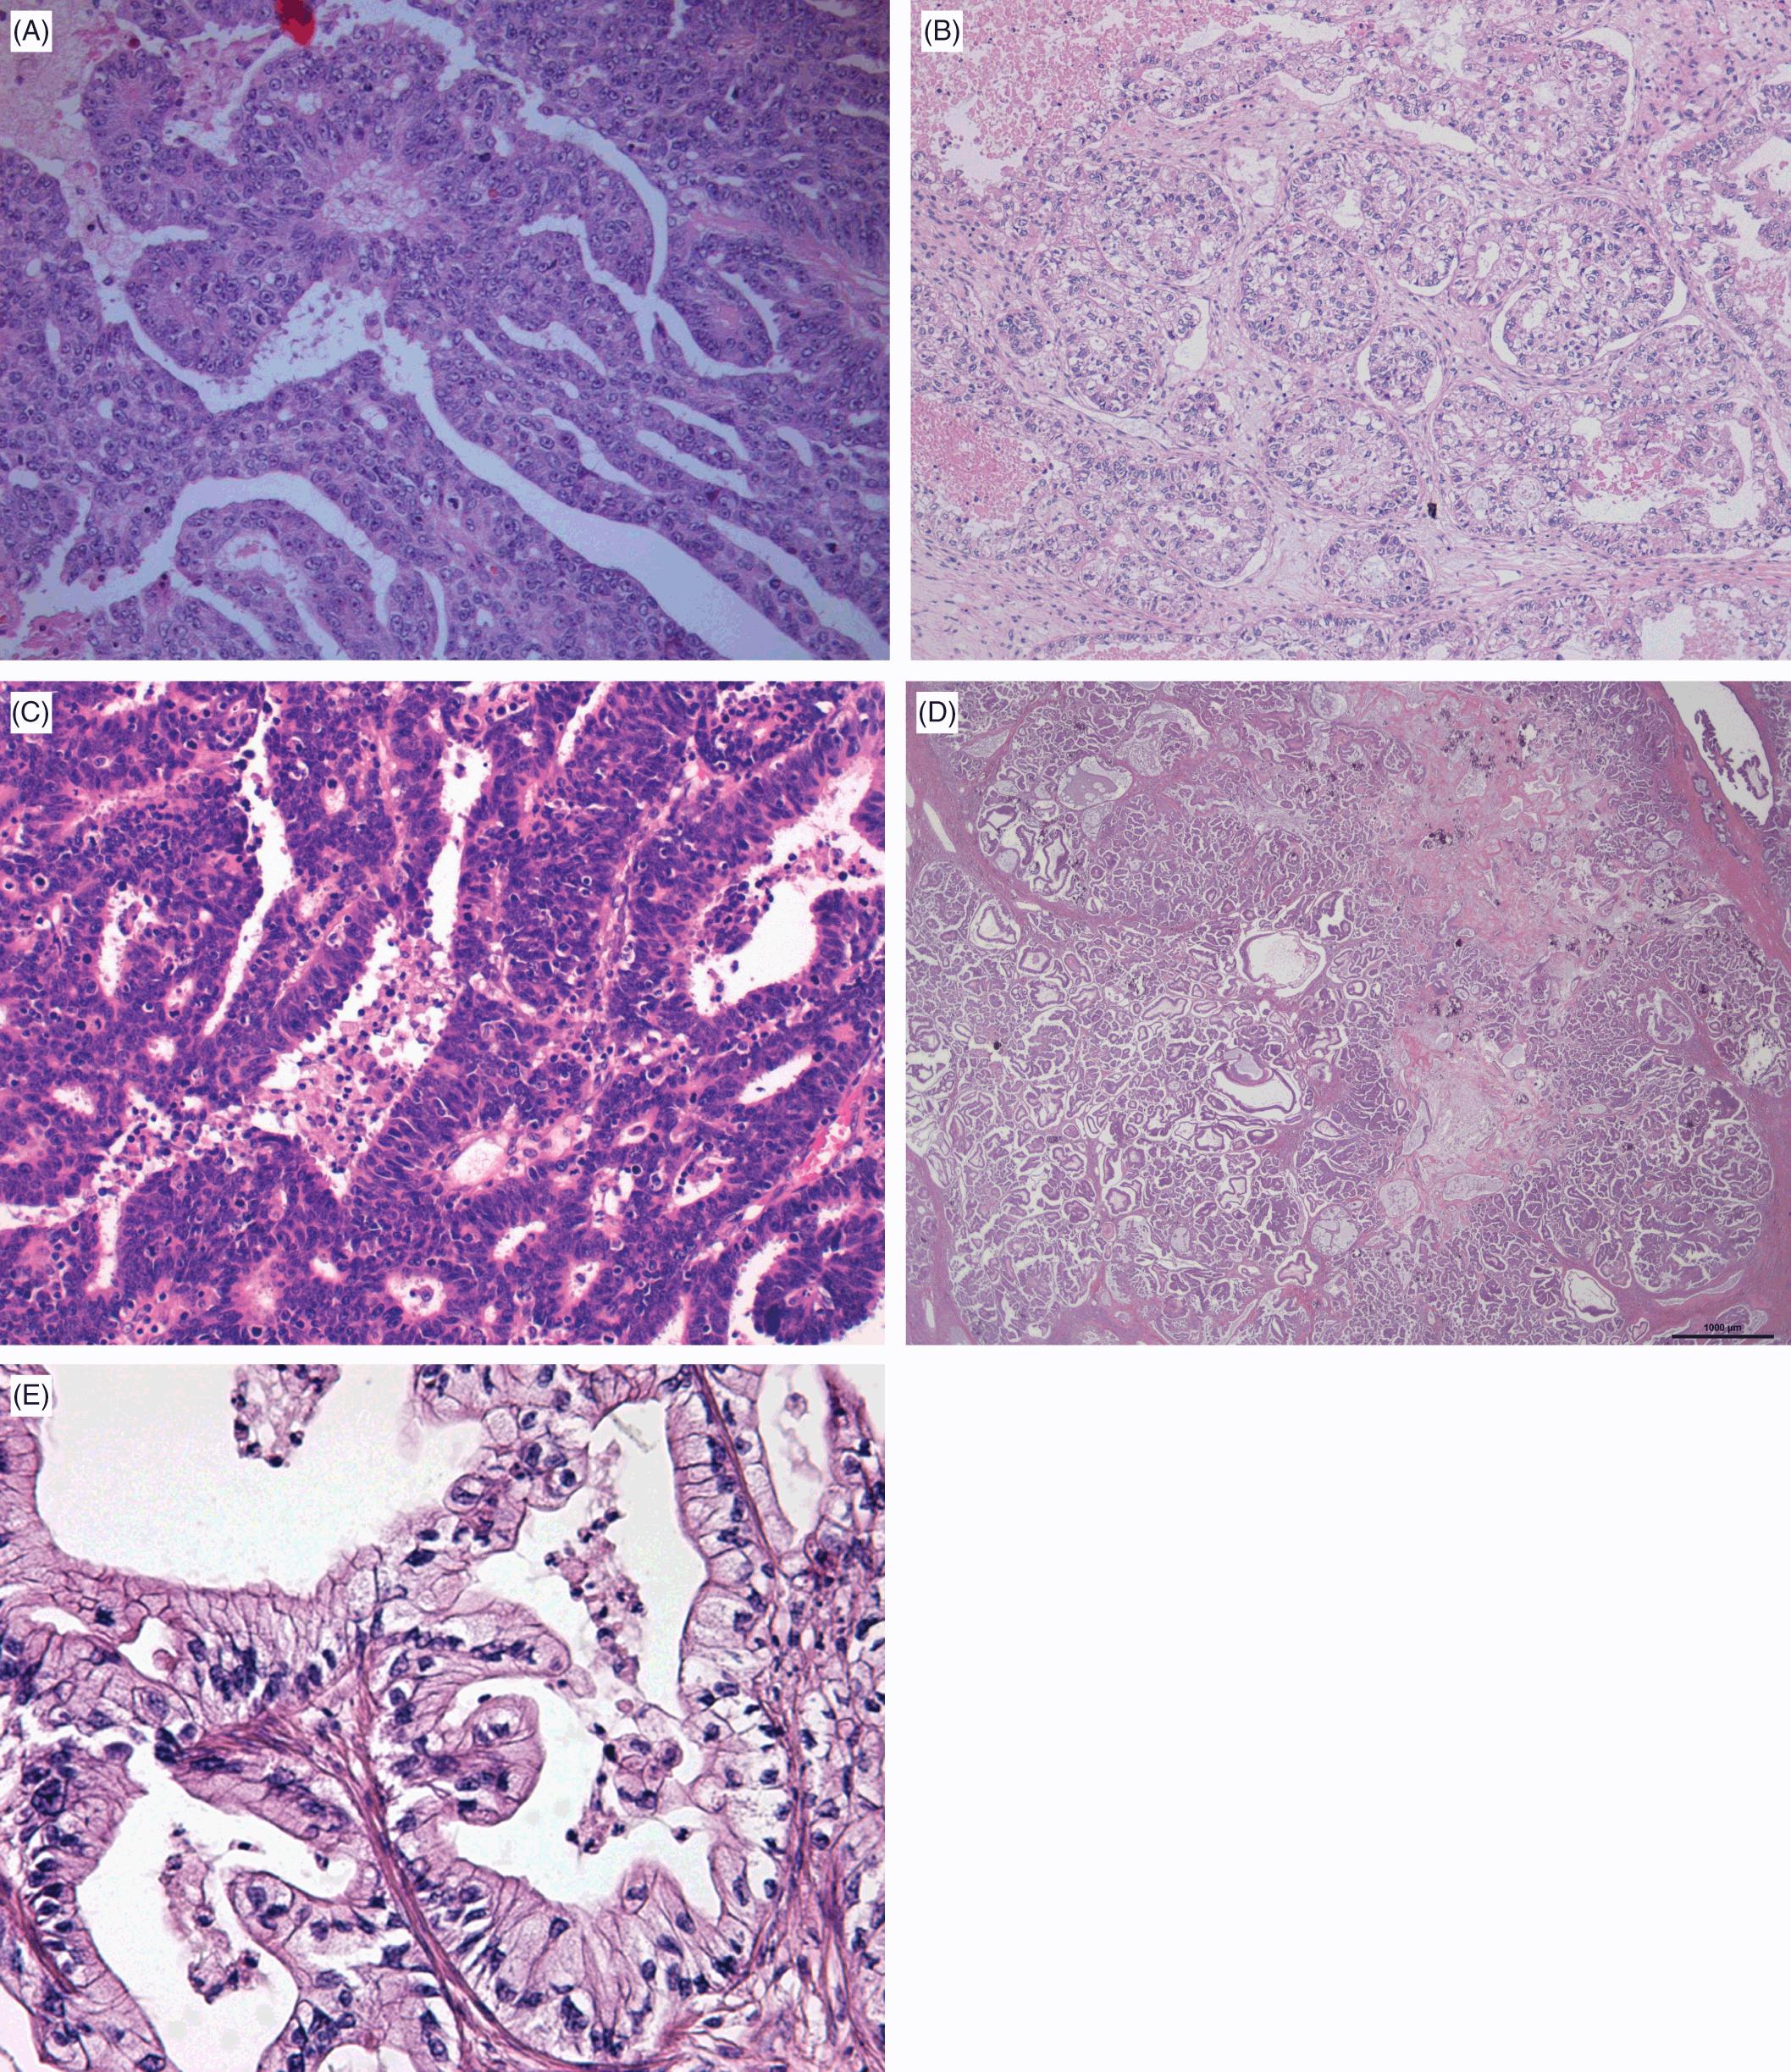 Ovarian Epithelial Stromal Tumors And Similar Lesions In The Testis Chapter 5 Gynecologic And Urologic Pathology